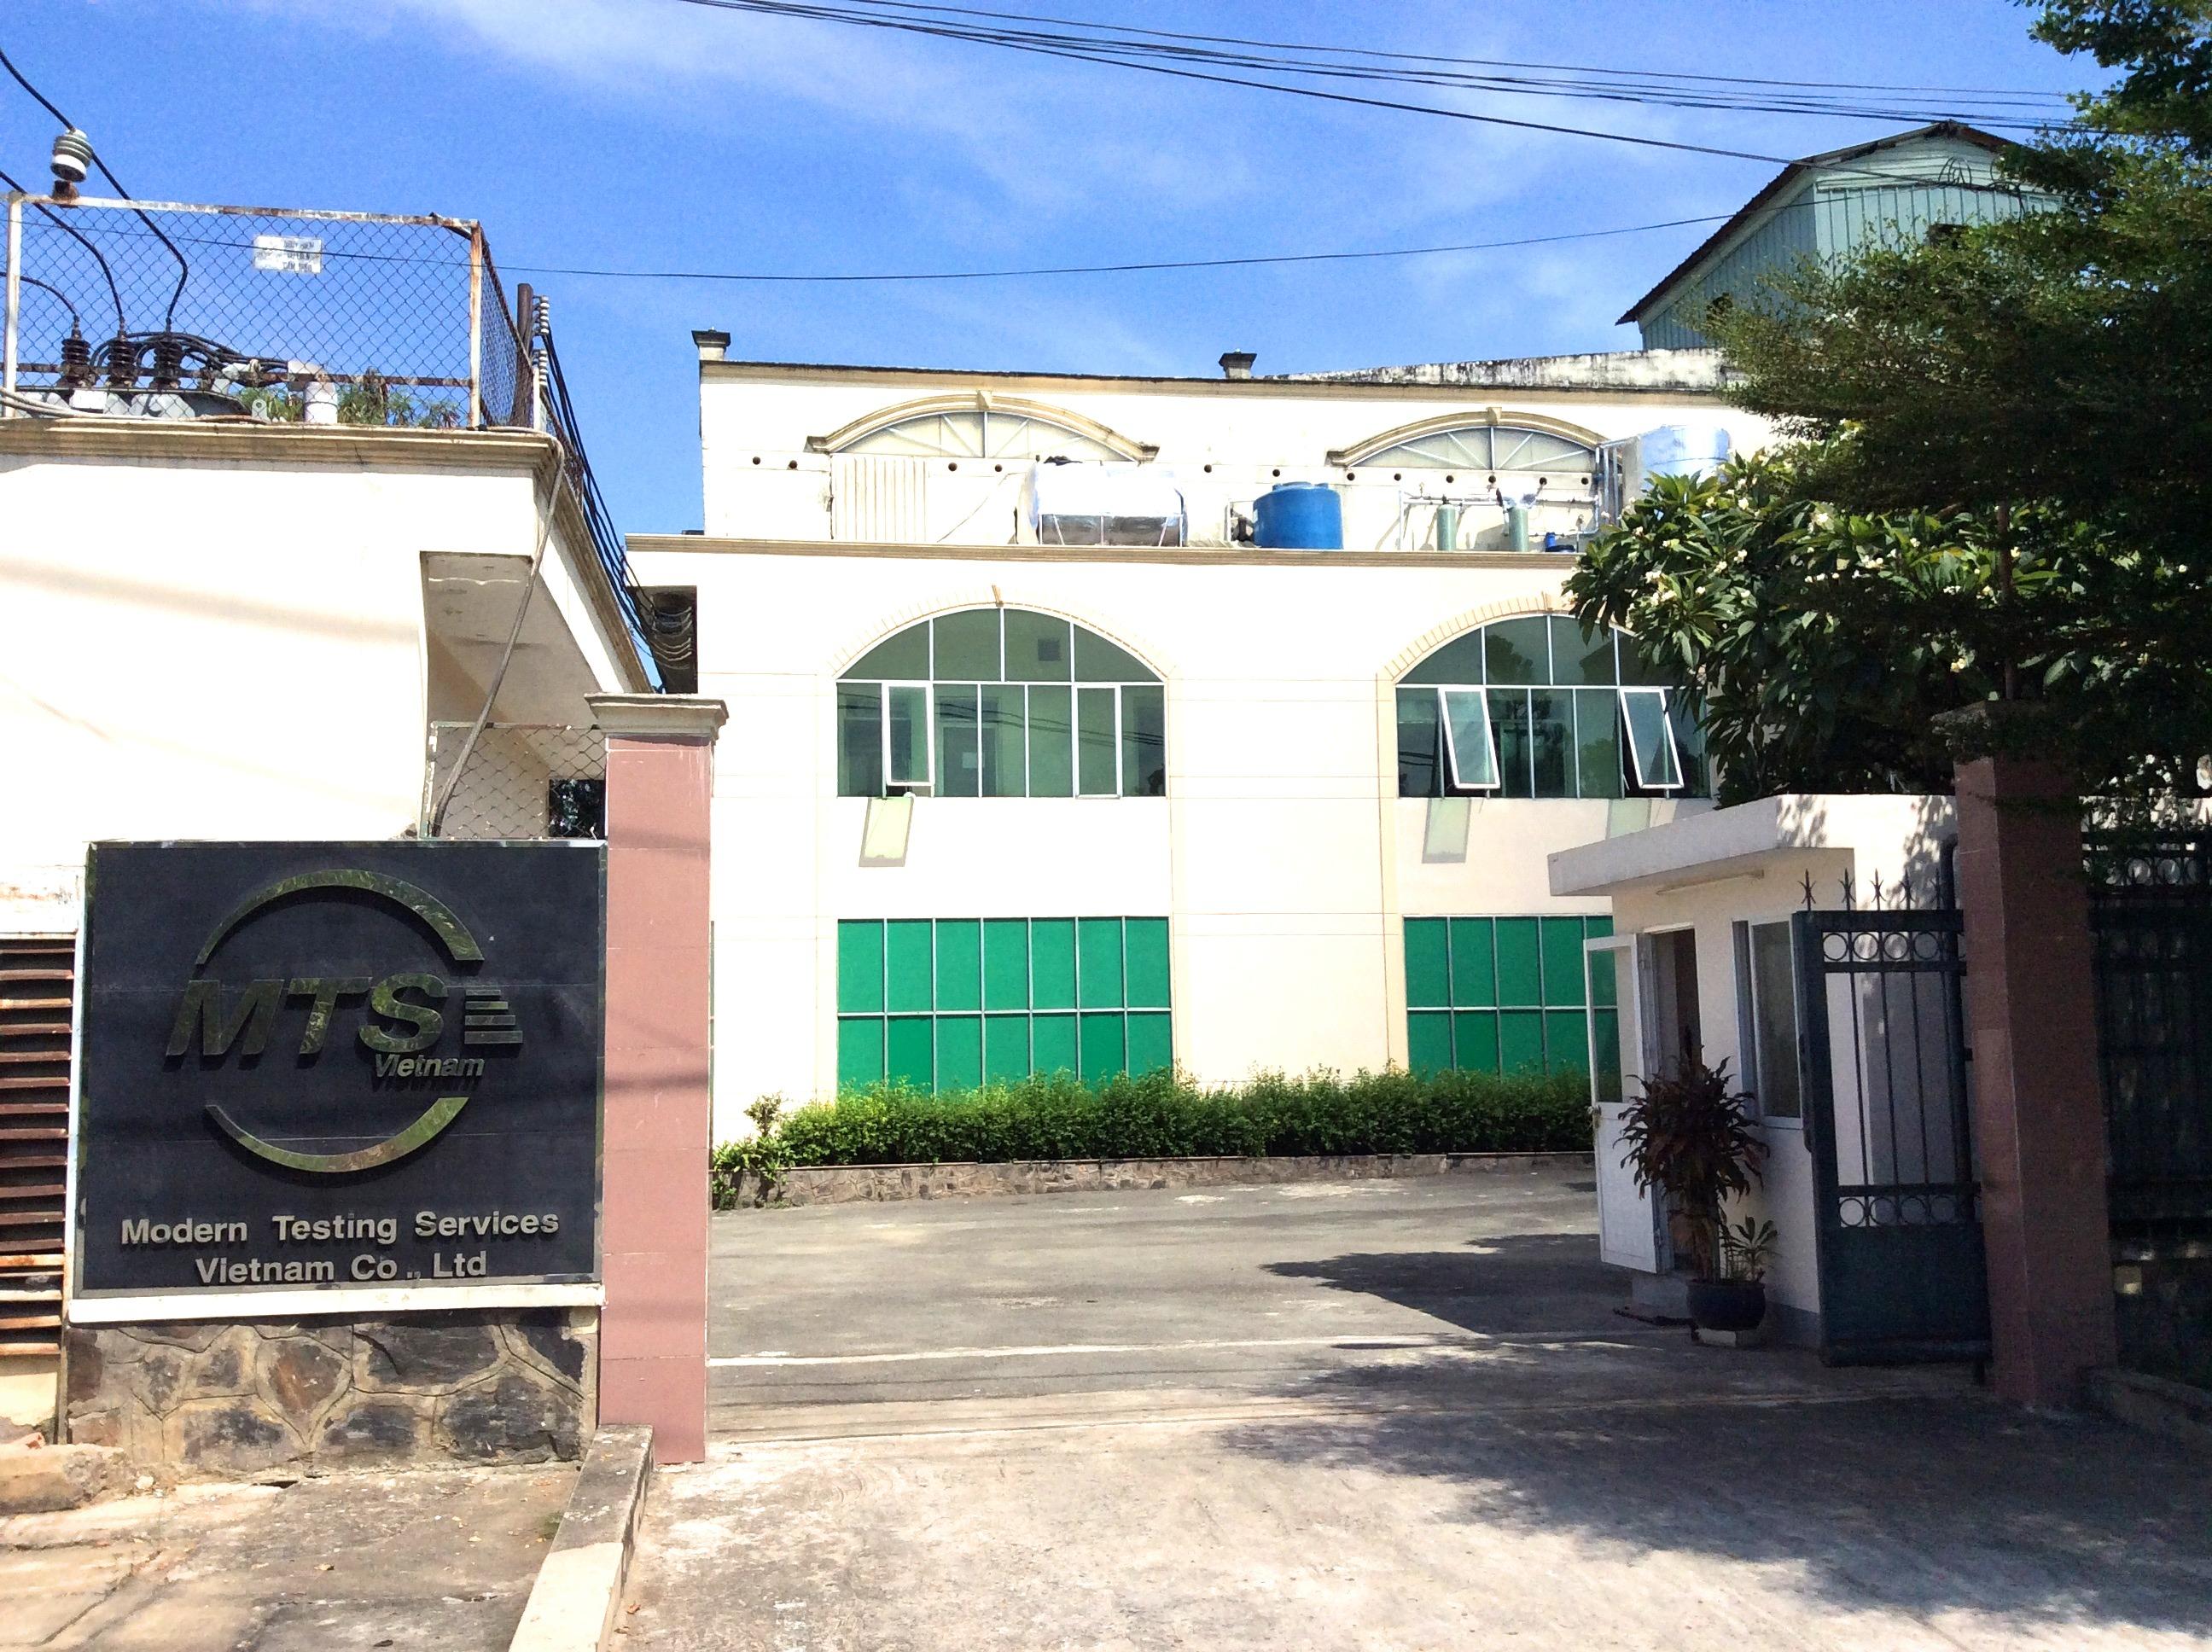 Vietnam Entrance